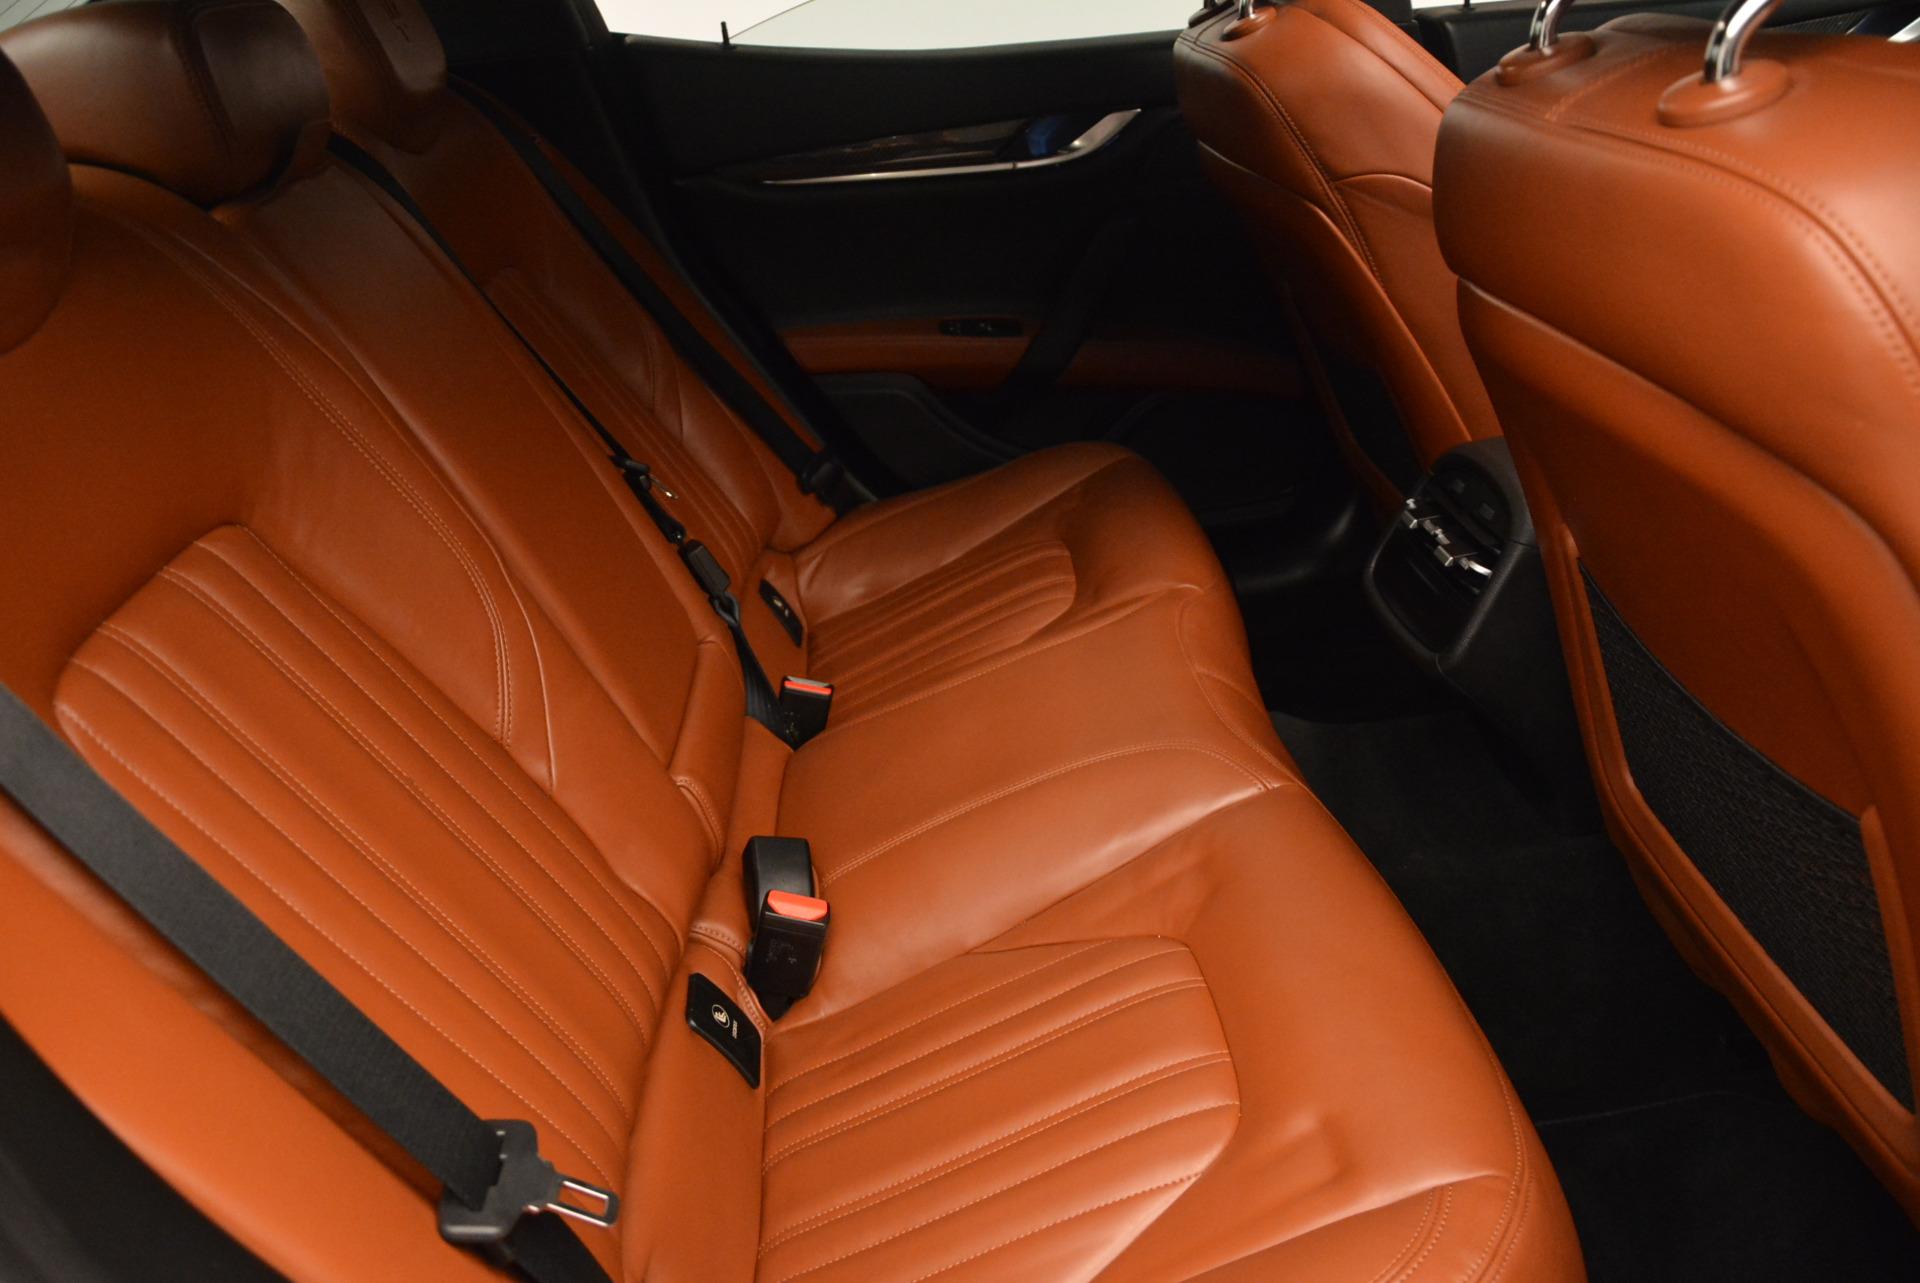 Used 2014 Maserati Ghibli S Q4 For Sale In Greenwich, CT 805_p24